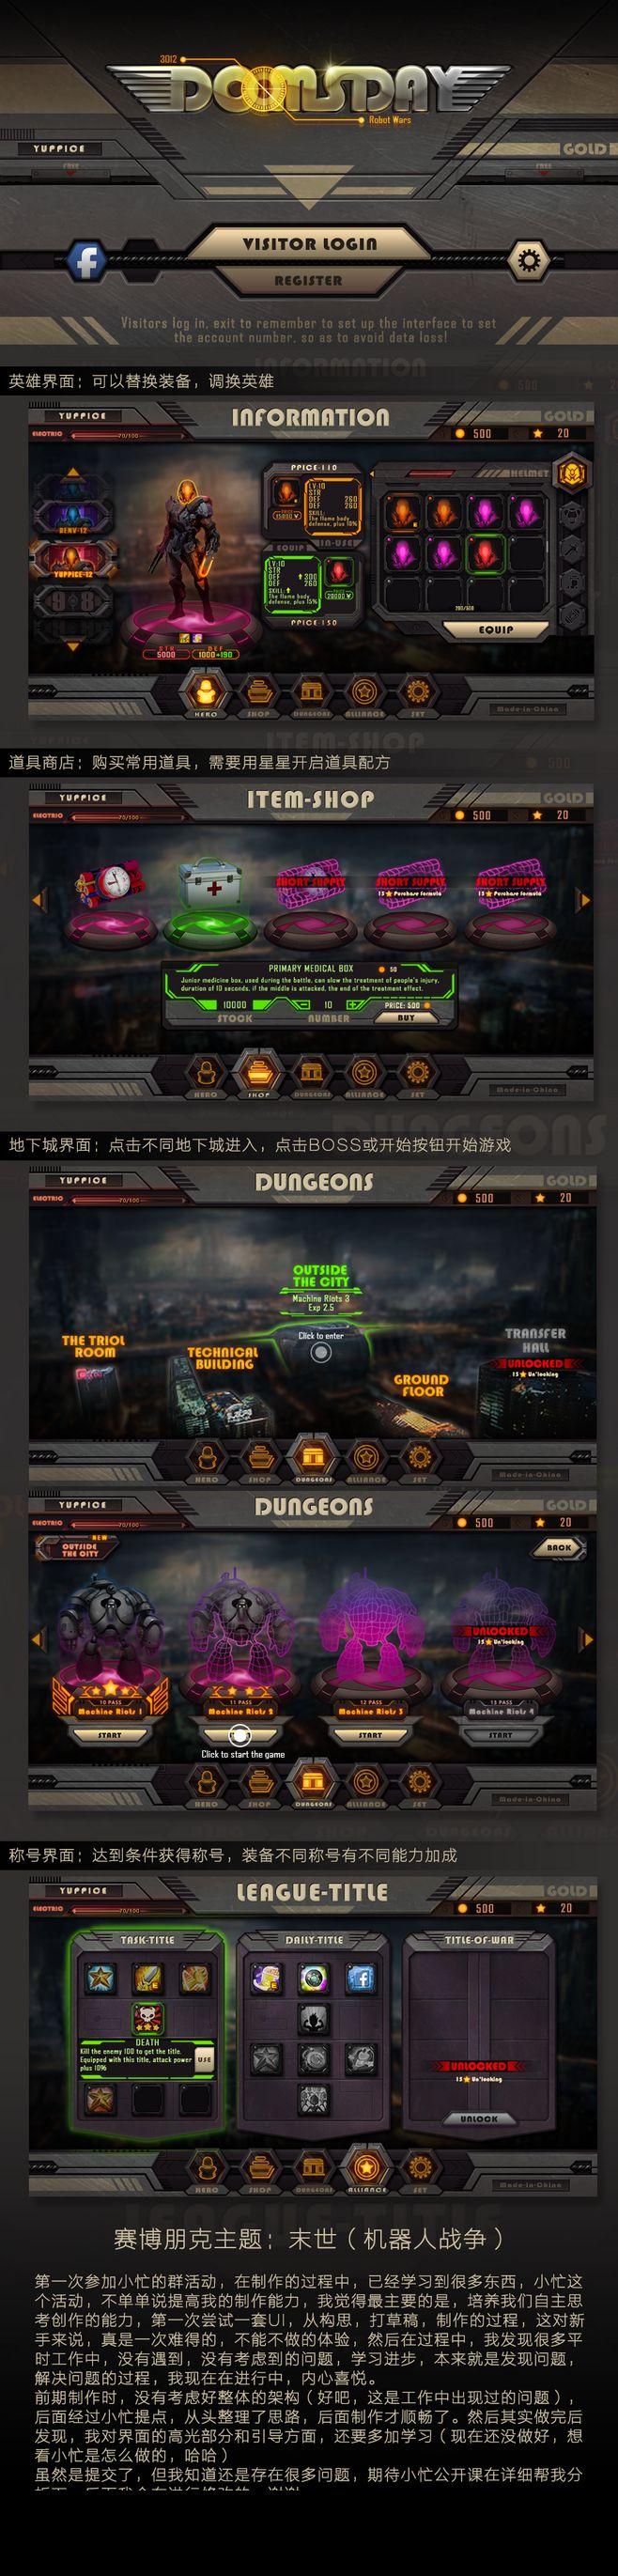 CyberPunk - 深圳-小航作品